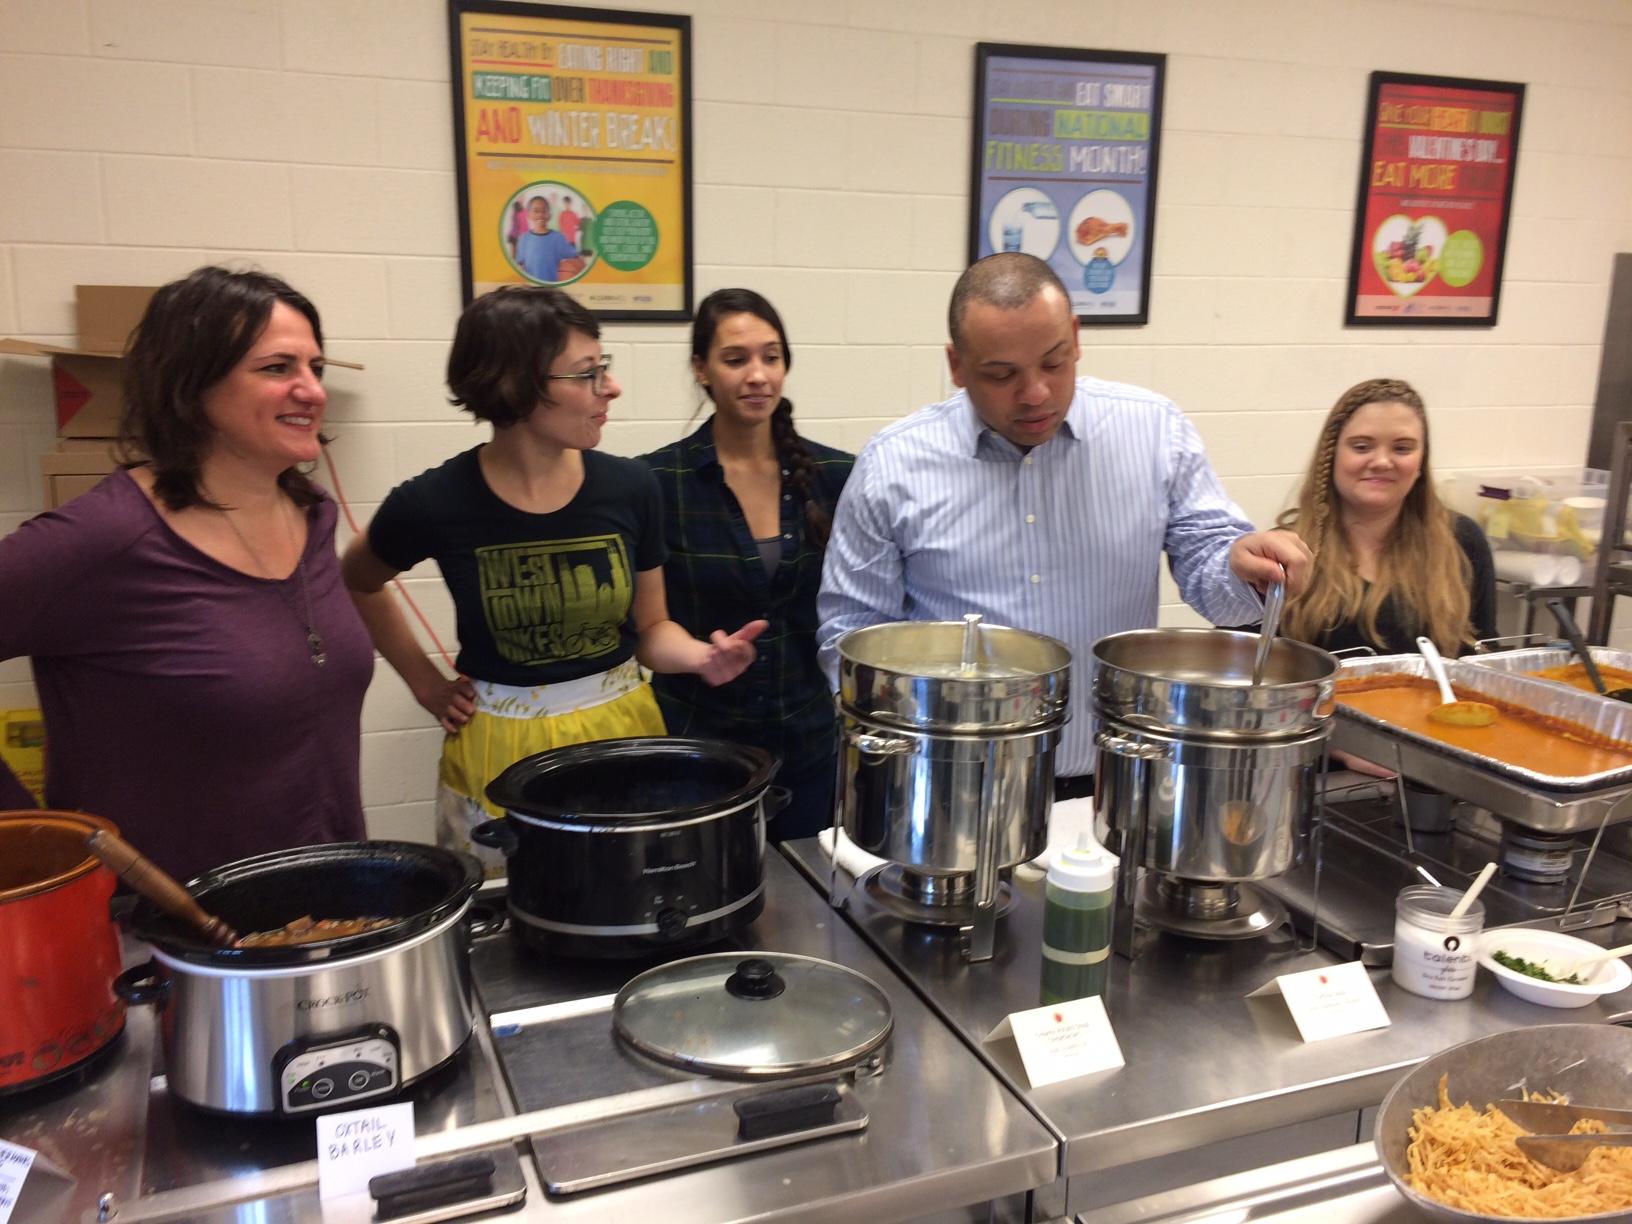 City Treasurer Kurt Summers joins the soup serving line.